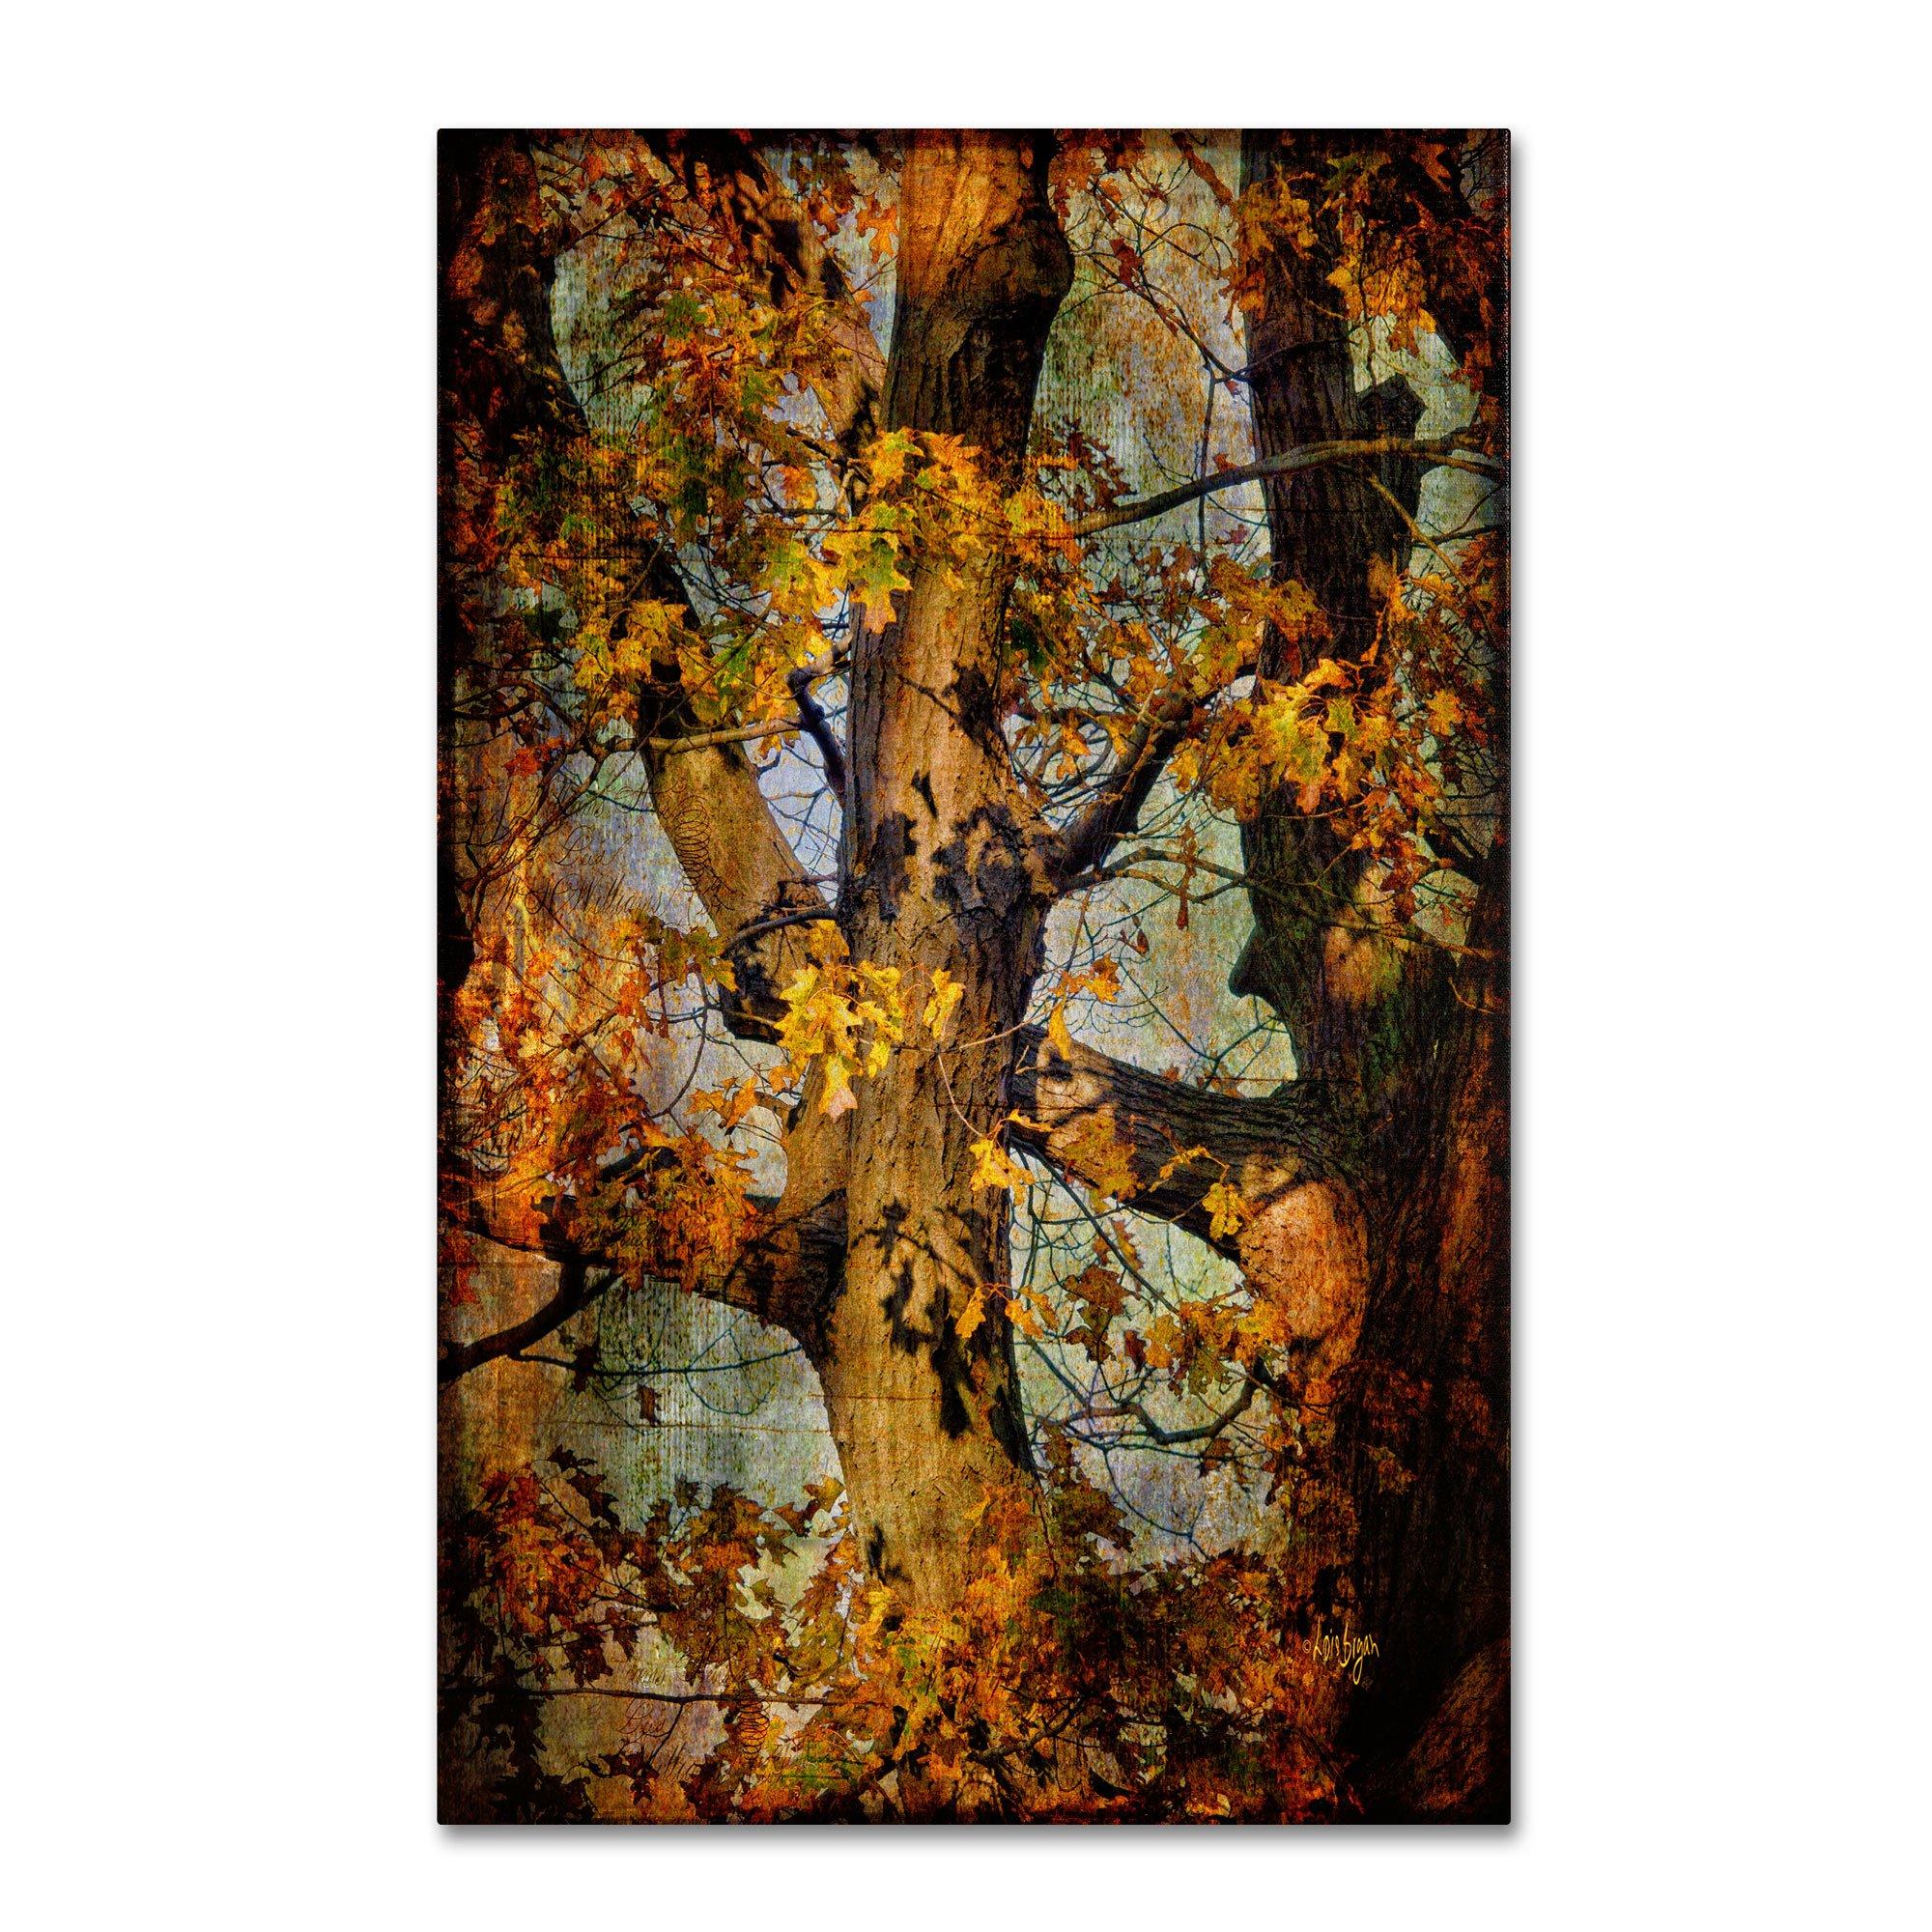 Autumn Oaks in Dance Mode Artwork by Lois Bryan, 12 by 19-Inch Canvas Wall Art